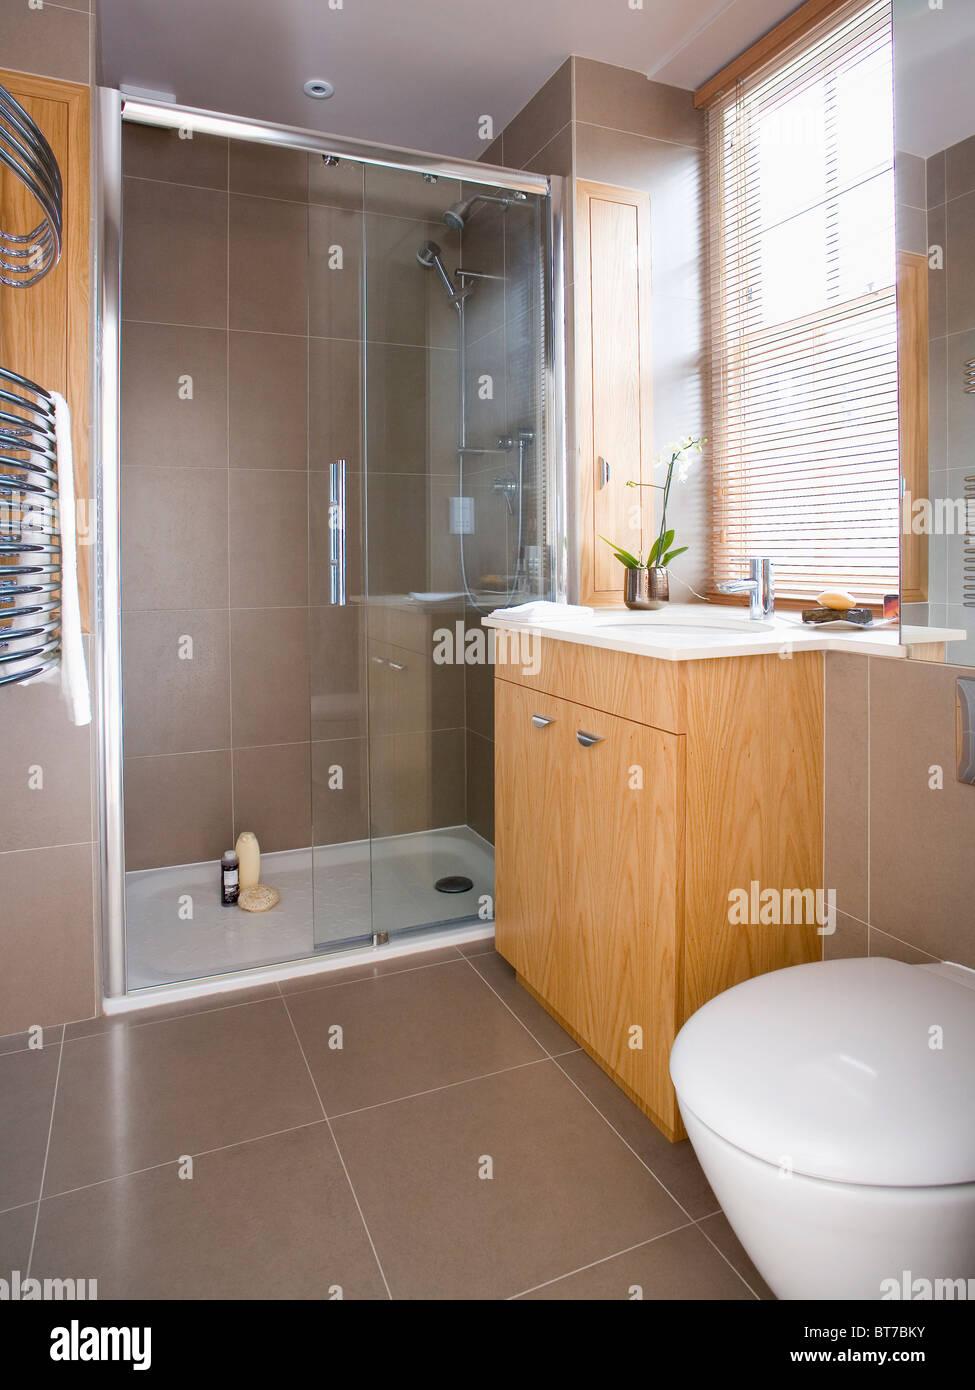 Glass doors on large walk-in shower in modern bathroom with beige ...